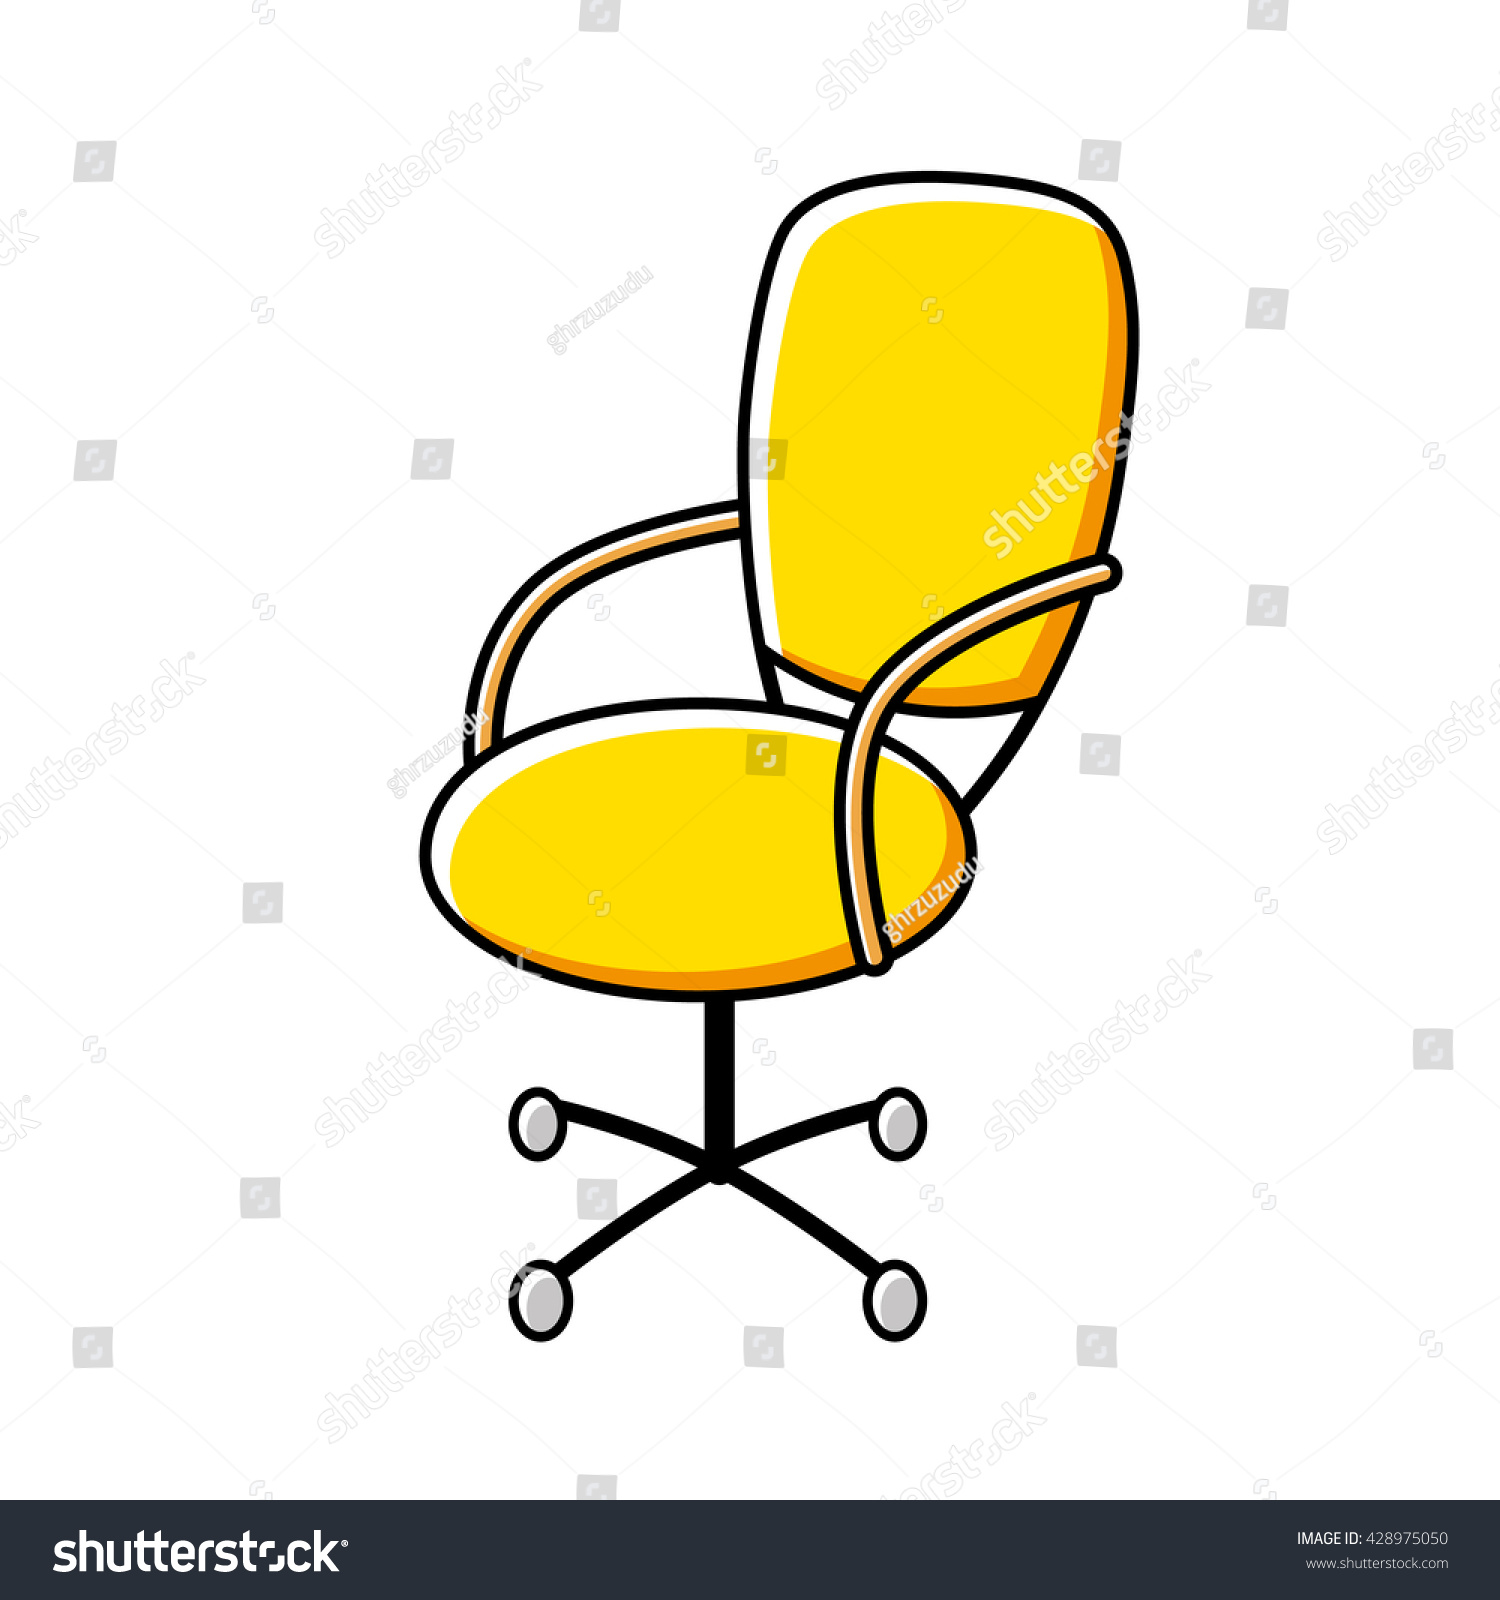 Yellow fice Chair Cartoon Icon Stock Vector Shutterstock